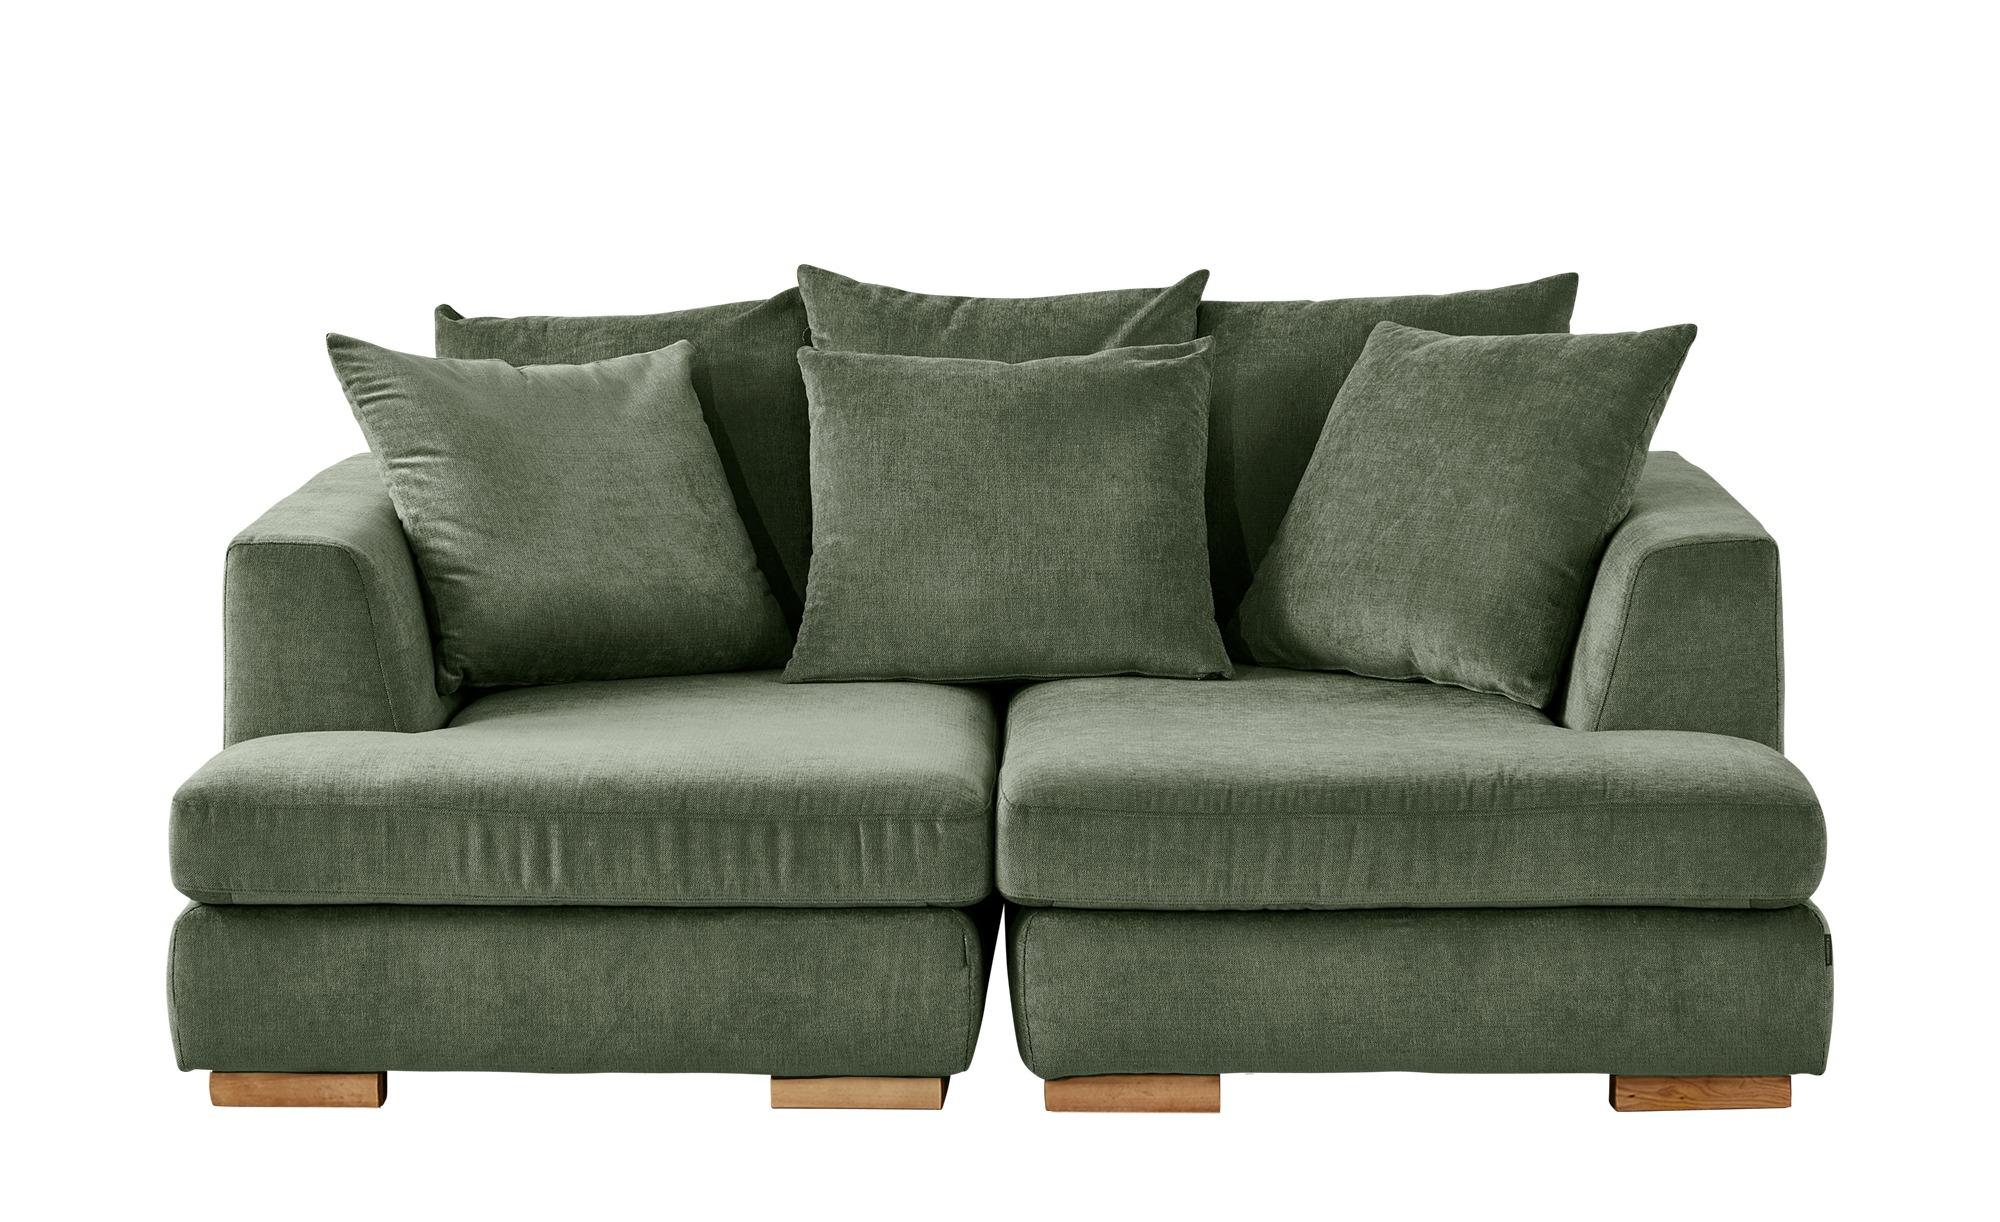 SOHO Loveseat grün - Webstoff Paso Doble ¦ grün ¦ Maße (cm): B: 202 H: 80 T: 156 Polstermöbel > Sofas > 2-Sitzer - Höffner